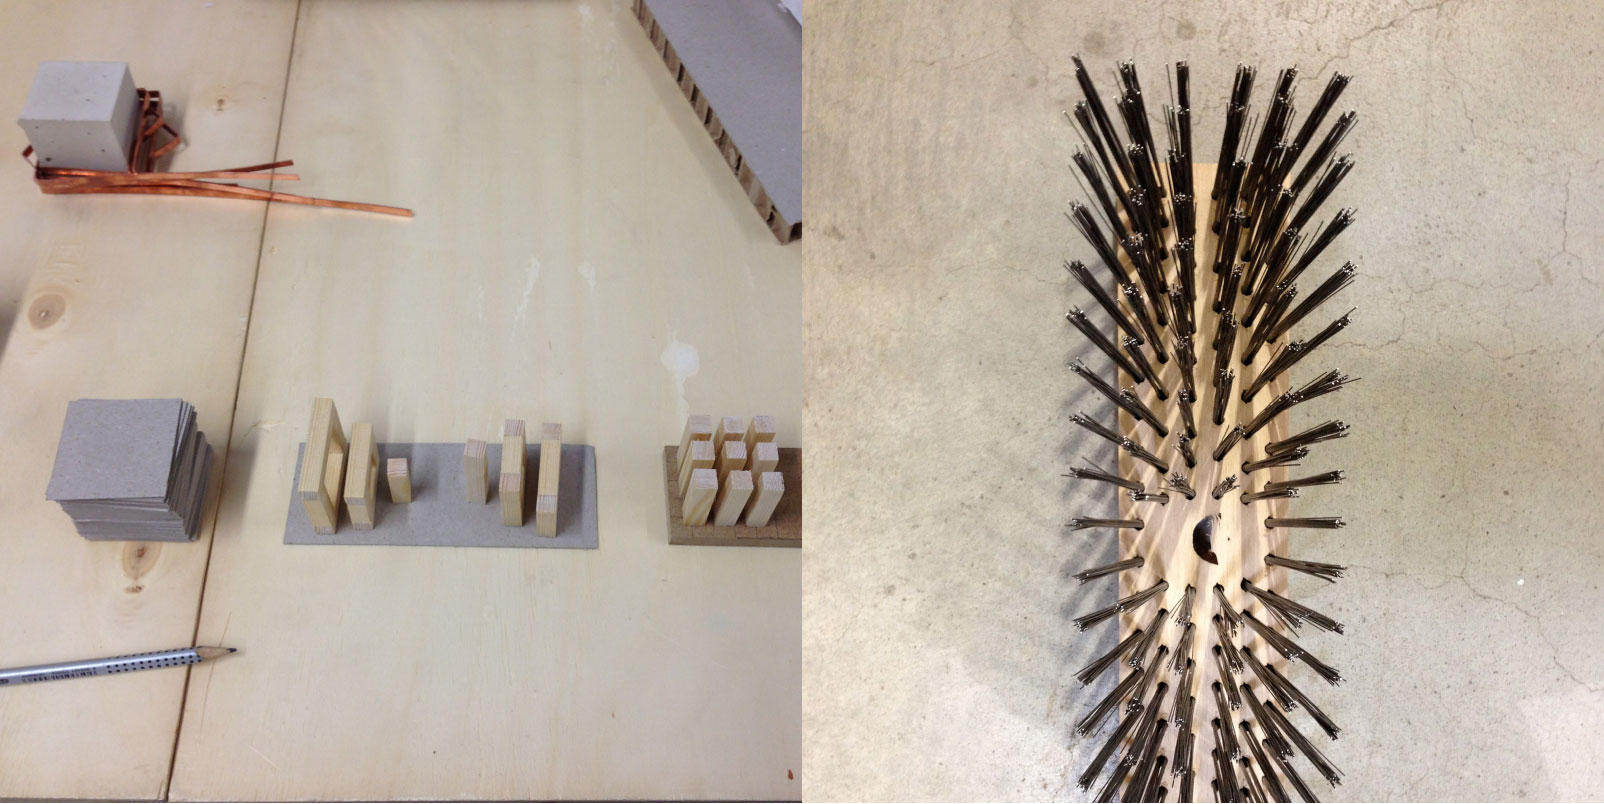 gerrit_schweiger-Nice_to_have-Must_have-unreachable-Accessoire-Accessory-Designprozess-Design_Thinking-Social_Design-Ausstellung-CAD-Raum-Illustration-Skulptur-Plakat-Typographie-Marke-Inspiration-11